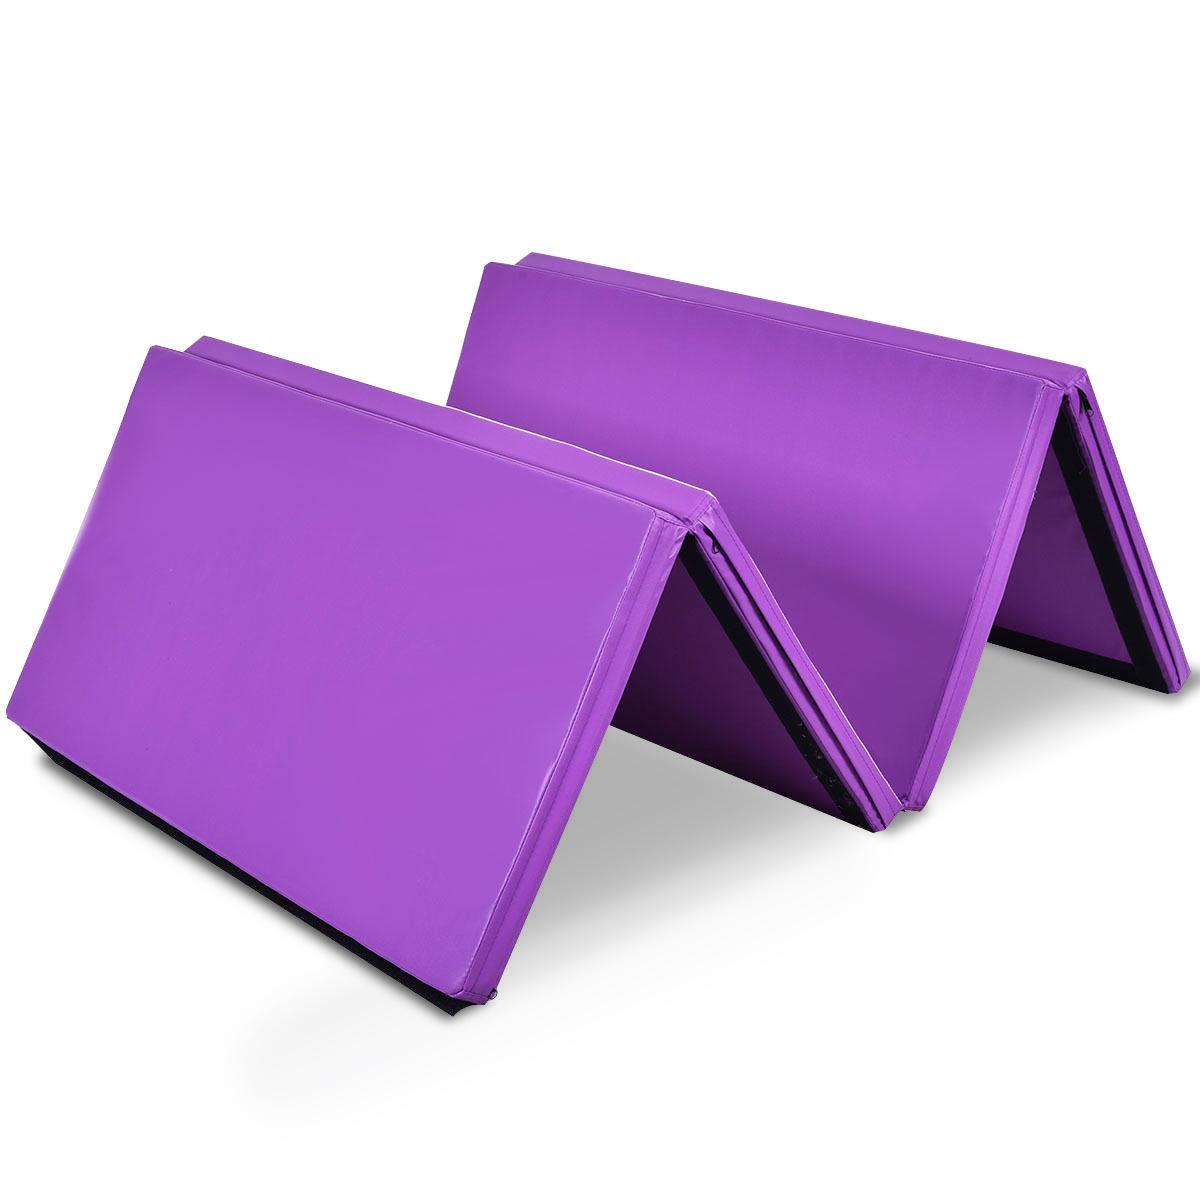 Two Size Thick Folding Panel Gymnastics Mat